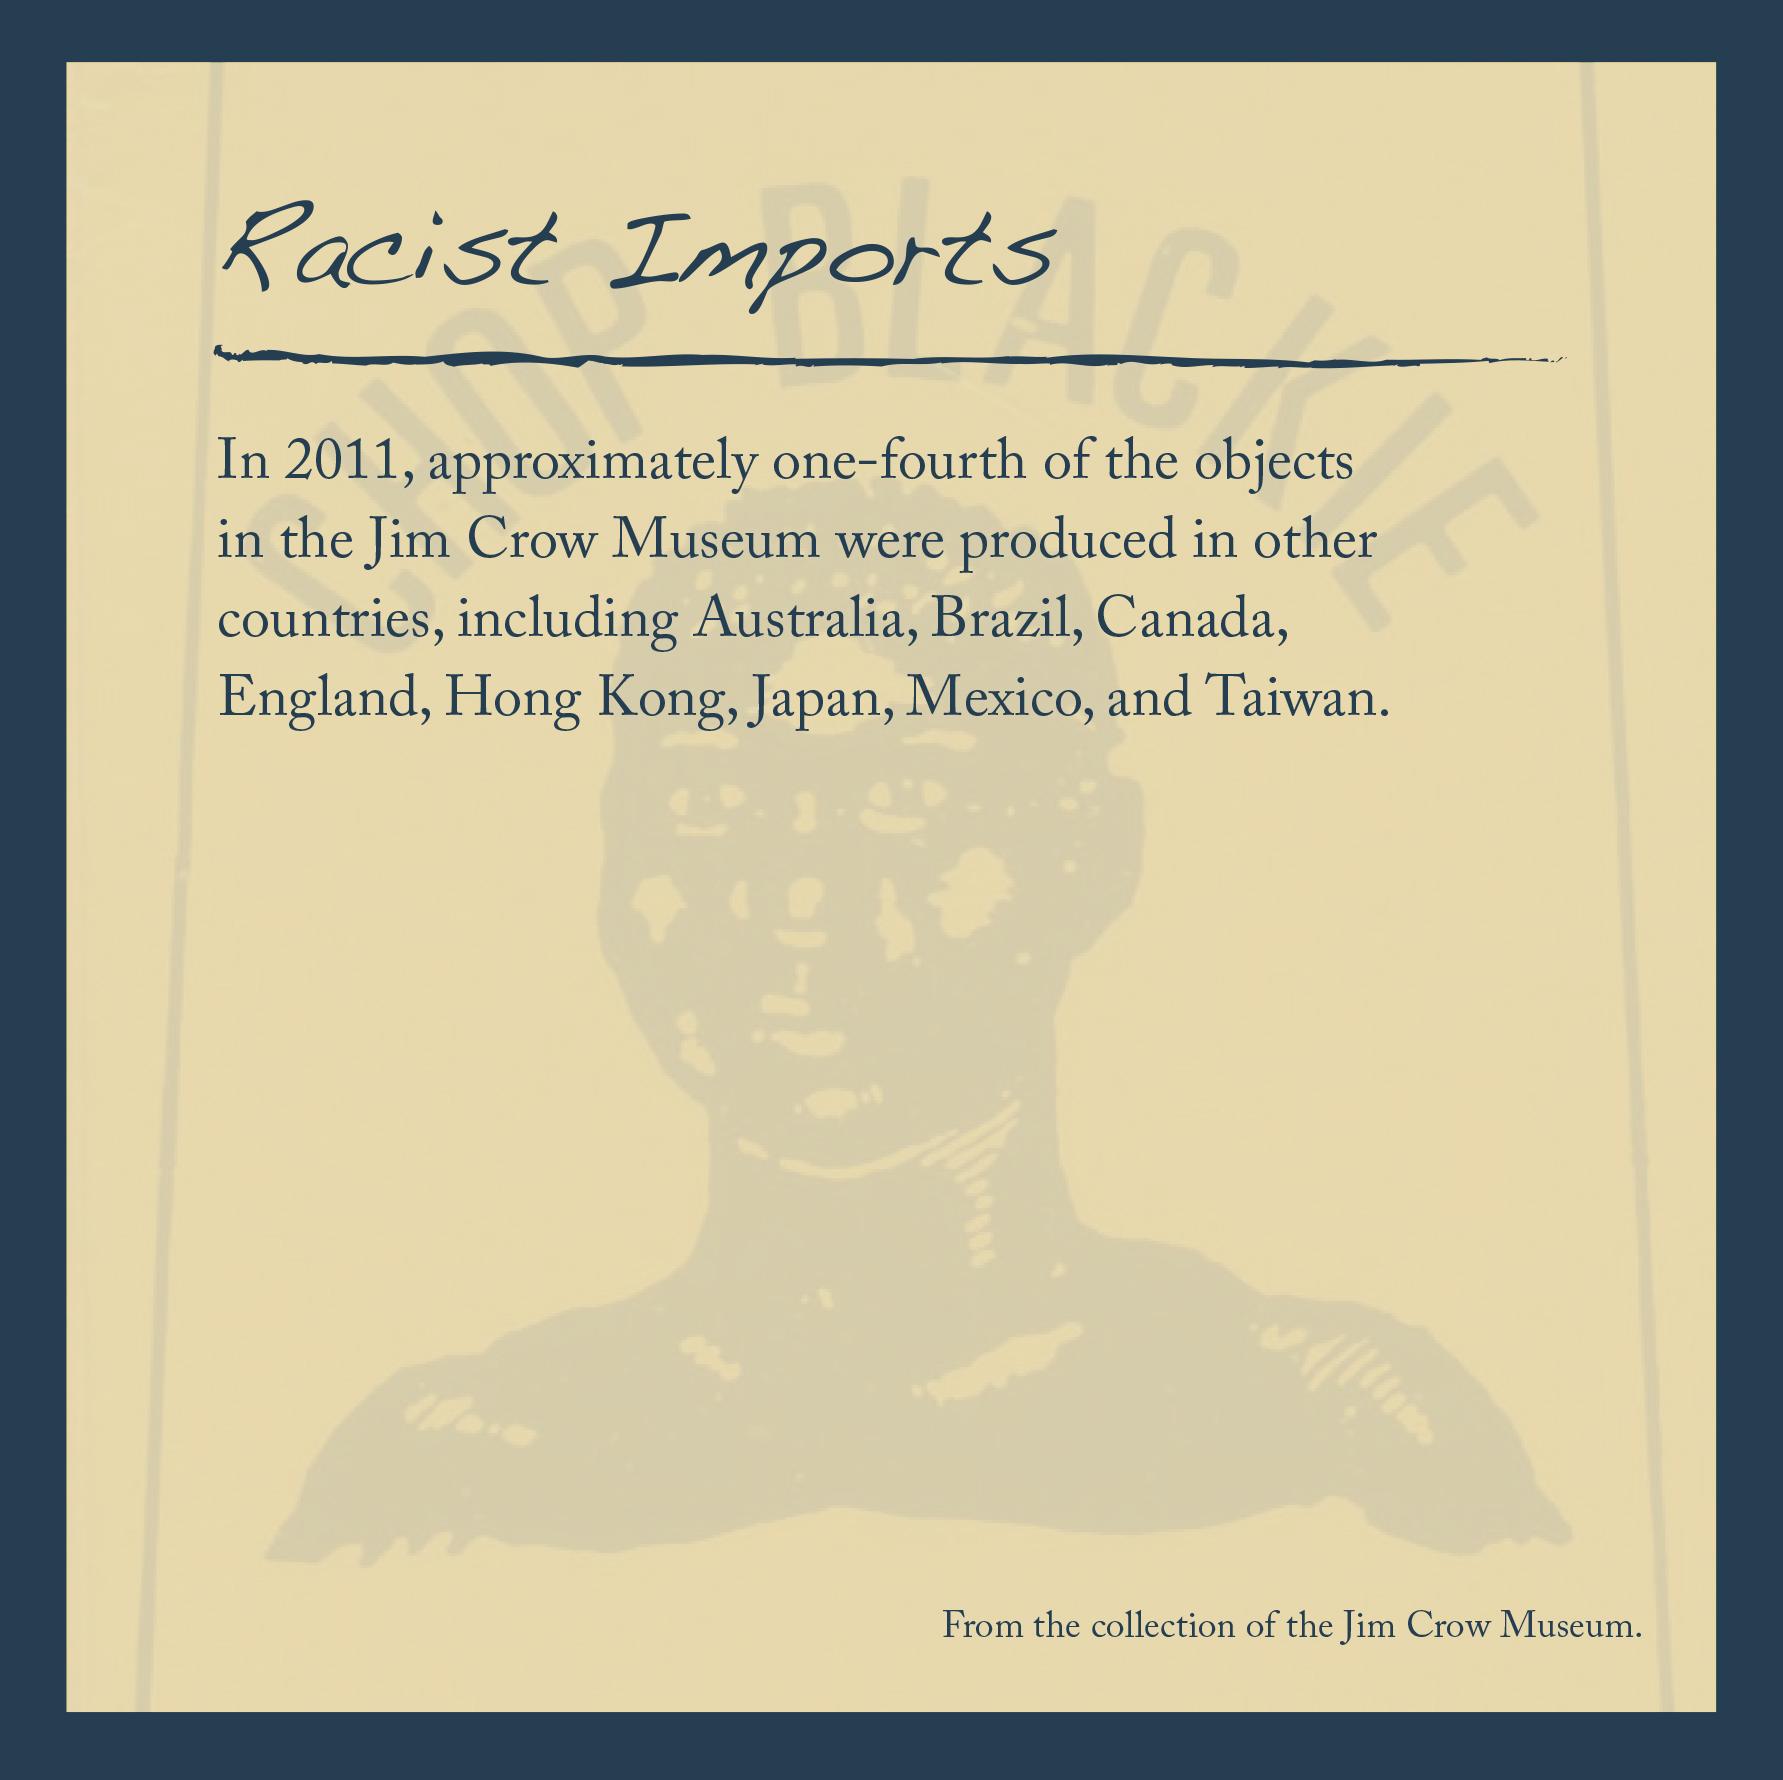 Racist Imports.jpg